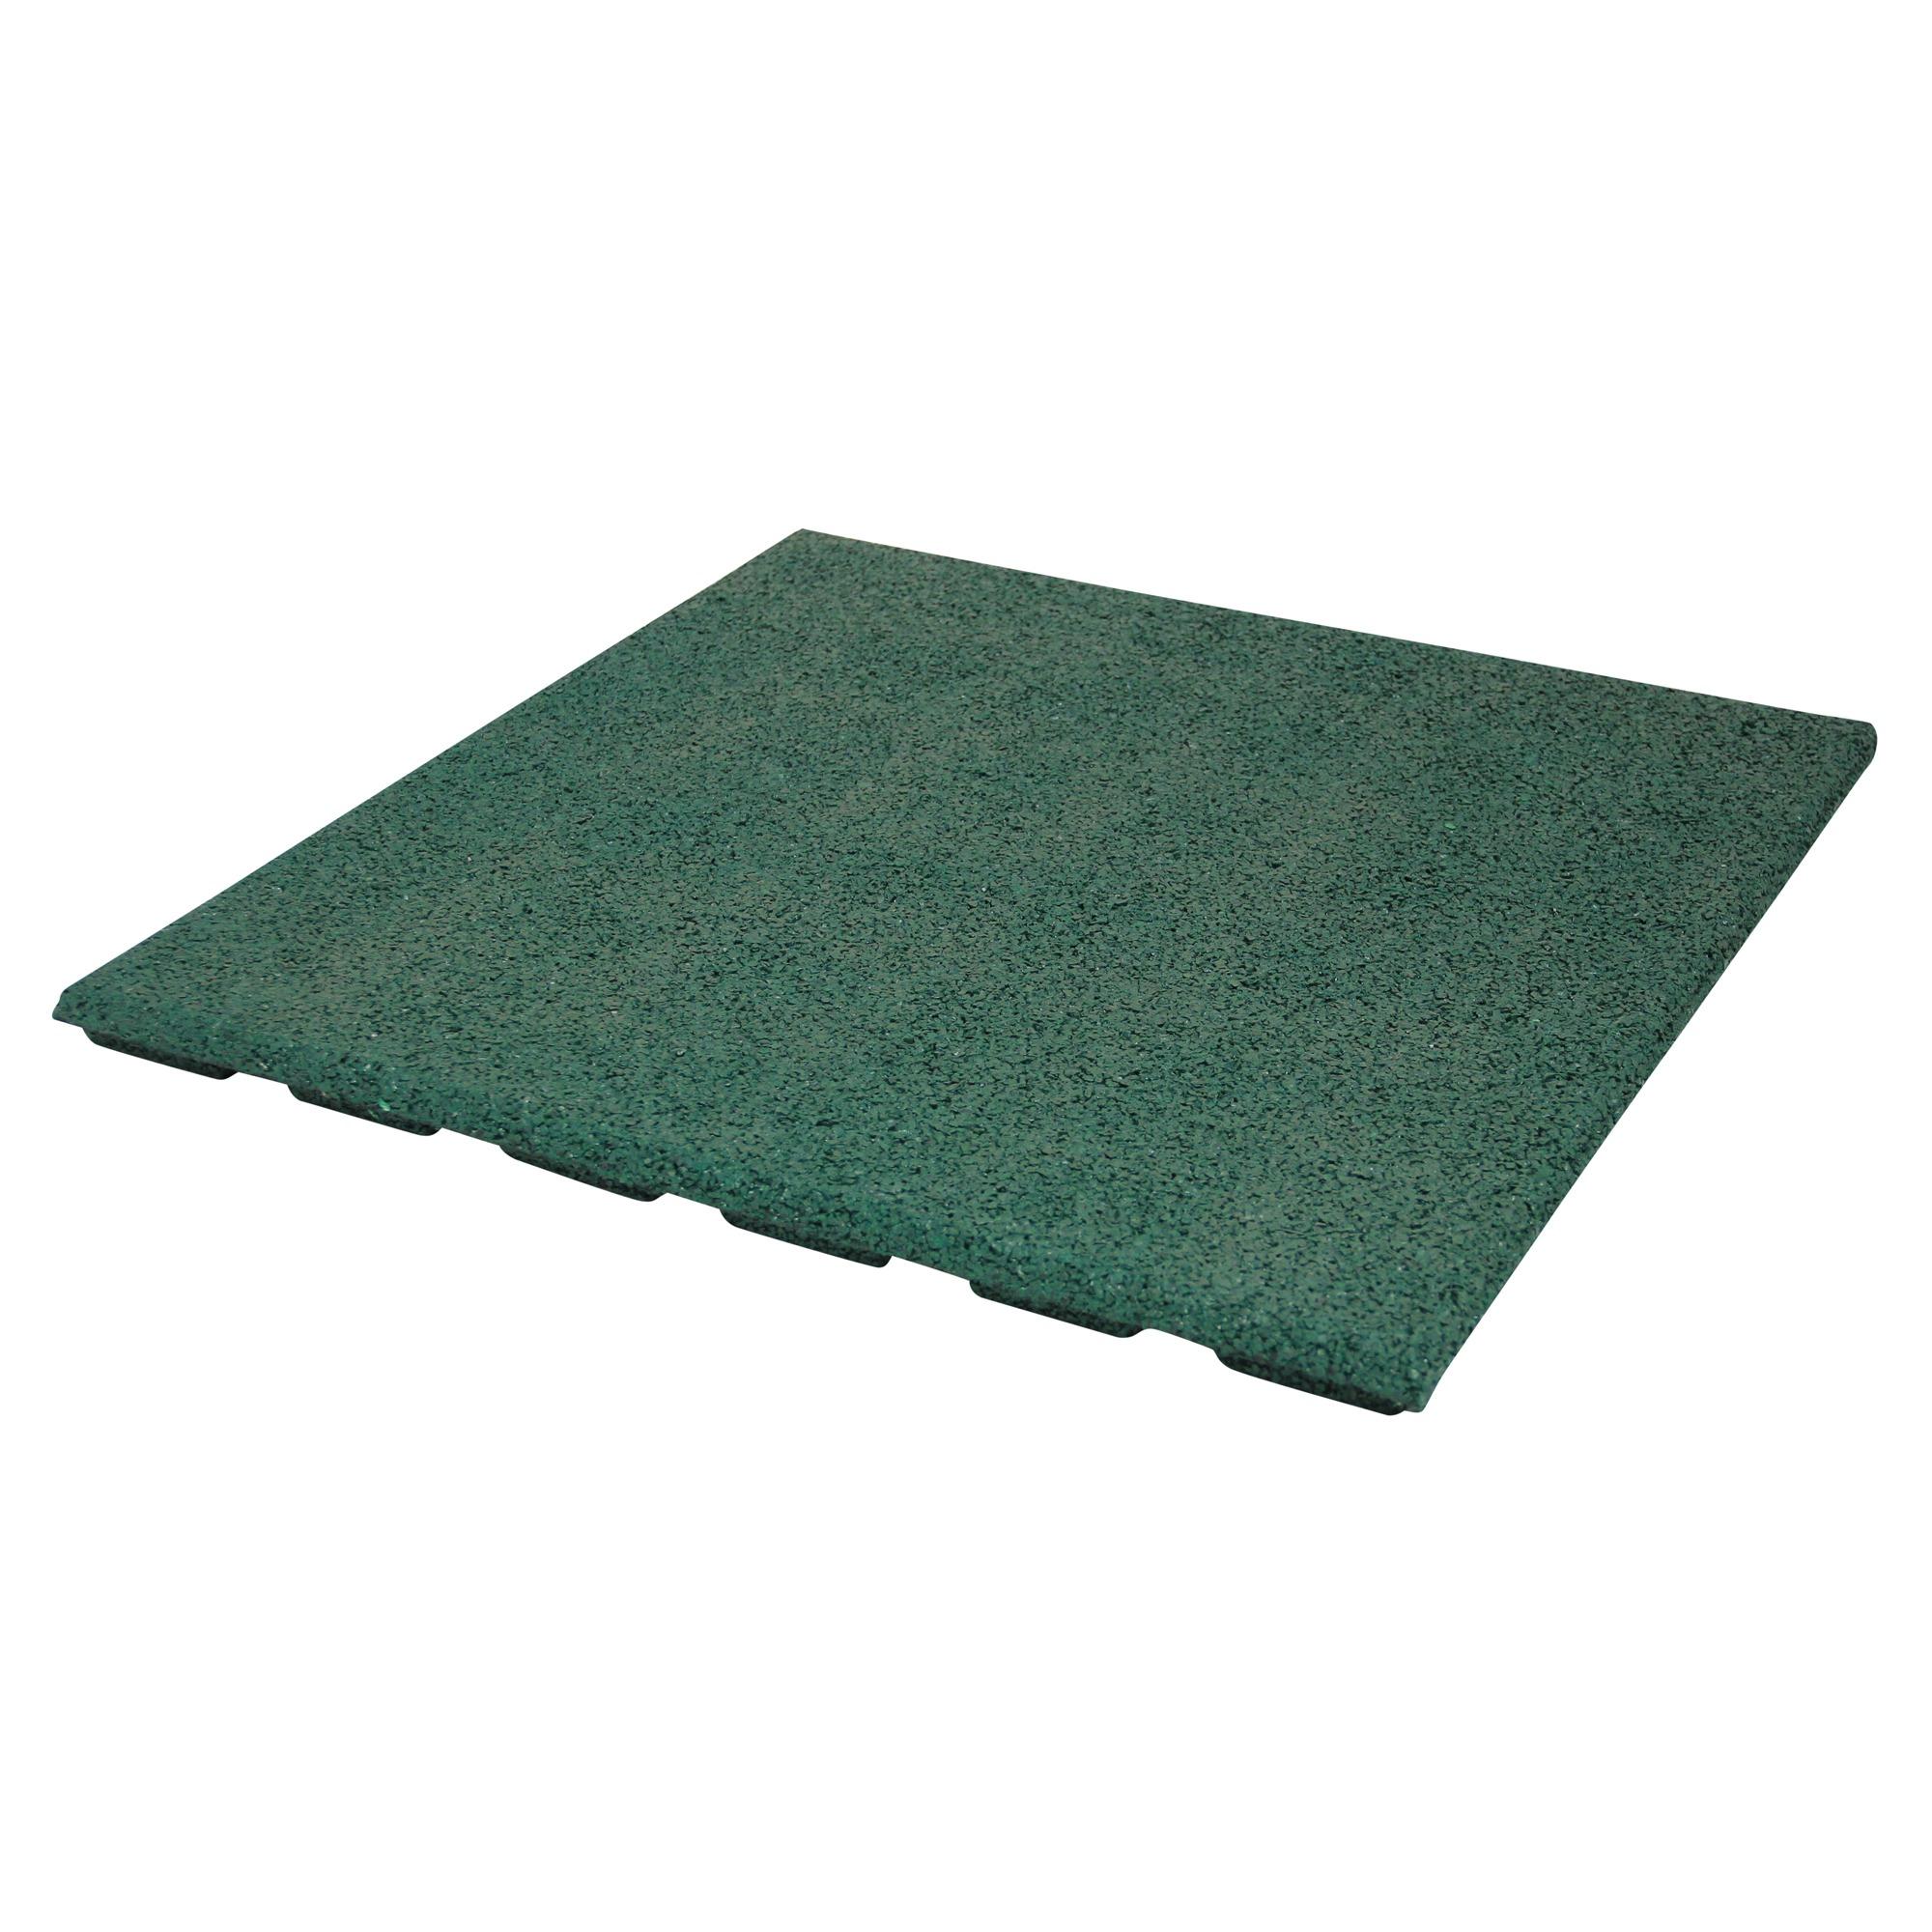 Terrastegel Rubber Groen 50x50 cm - 46 Tegels - 11,50 m2